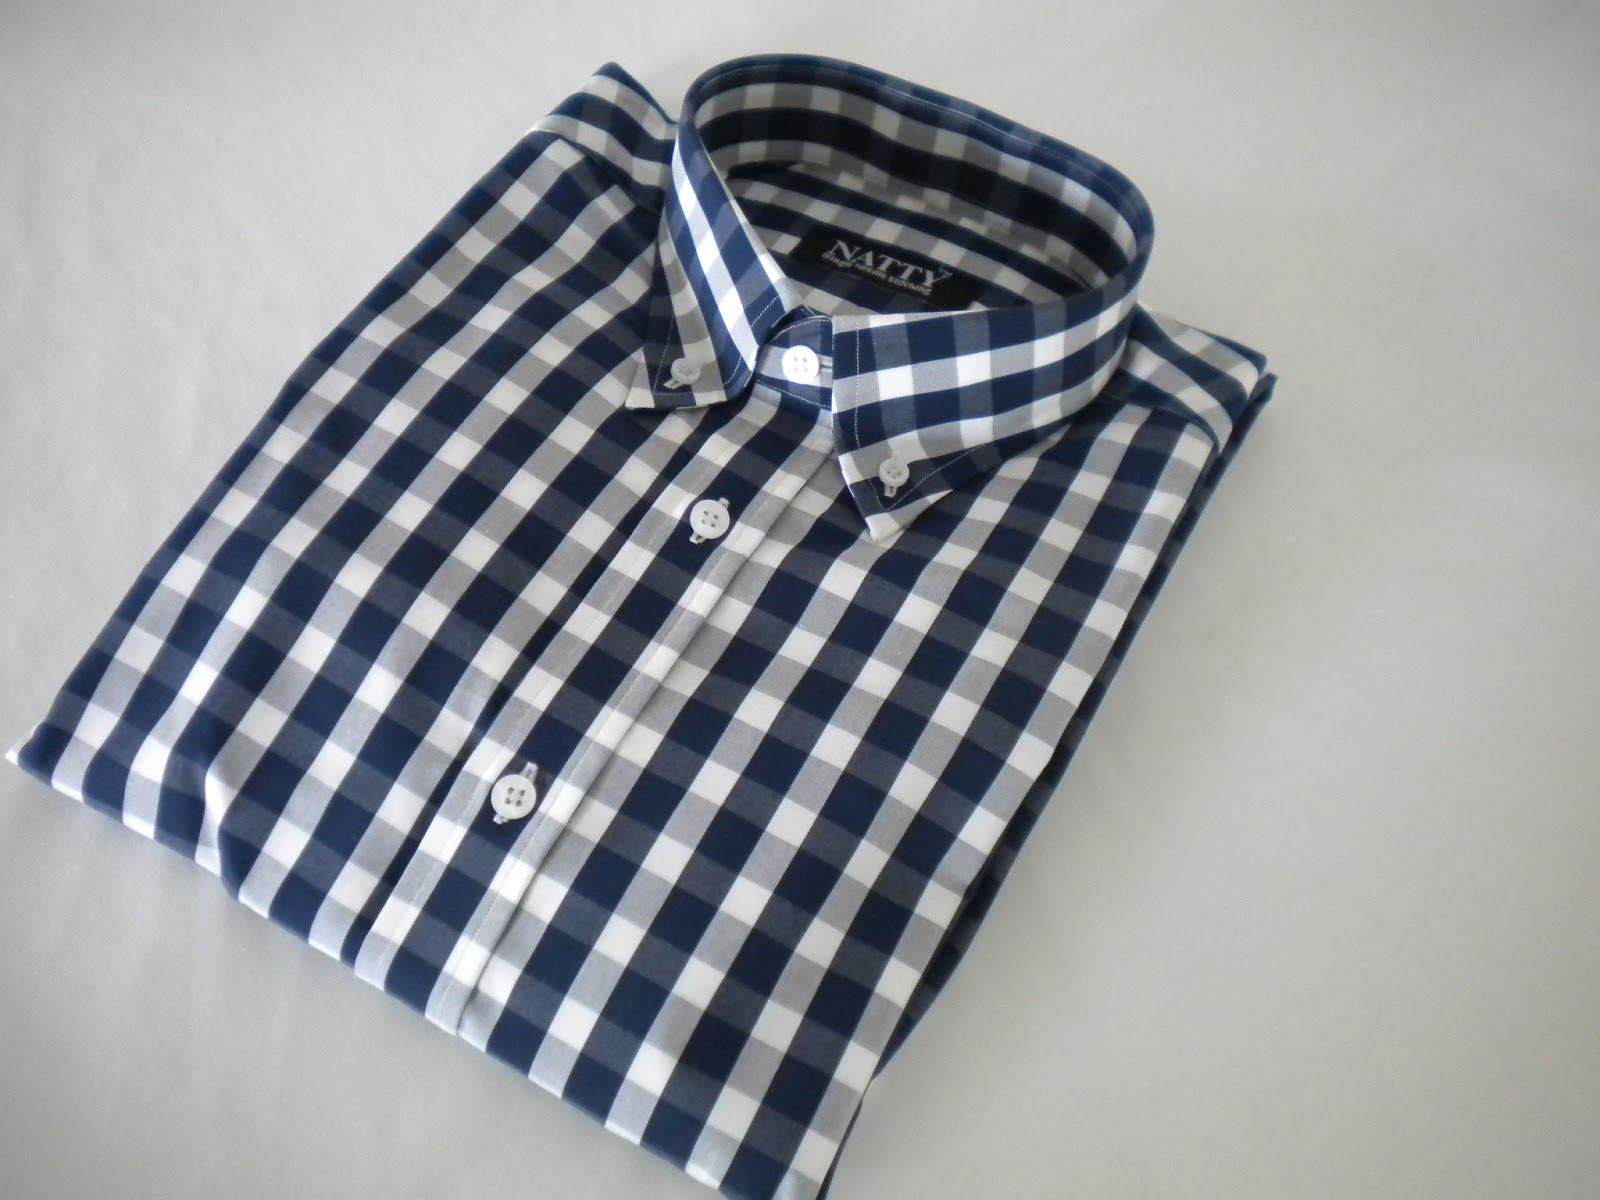 Fashion style Dress Custom shirts online for girls